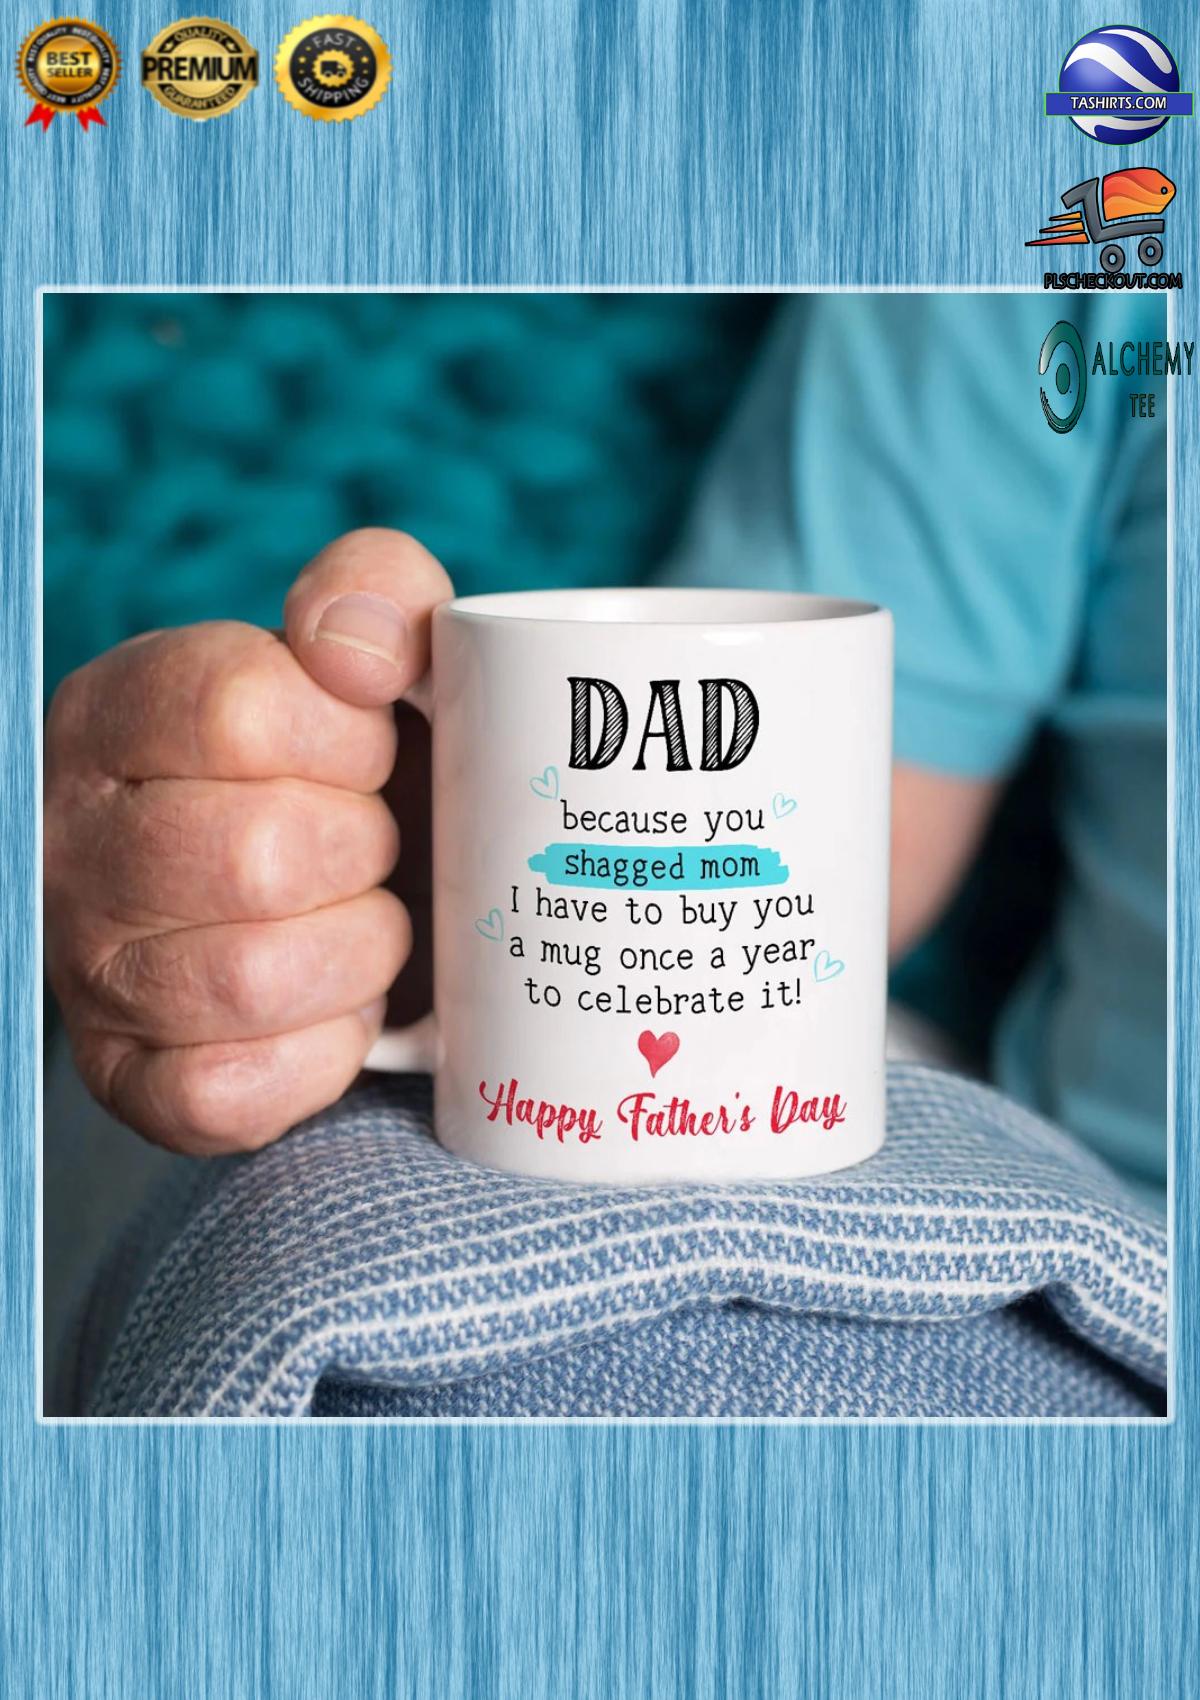 Dad because you shagged mom i have to buy you a mug